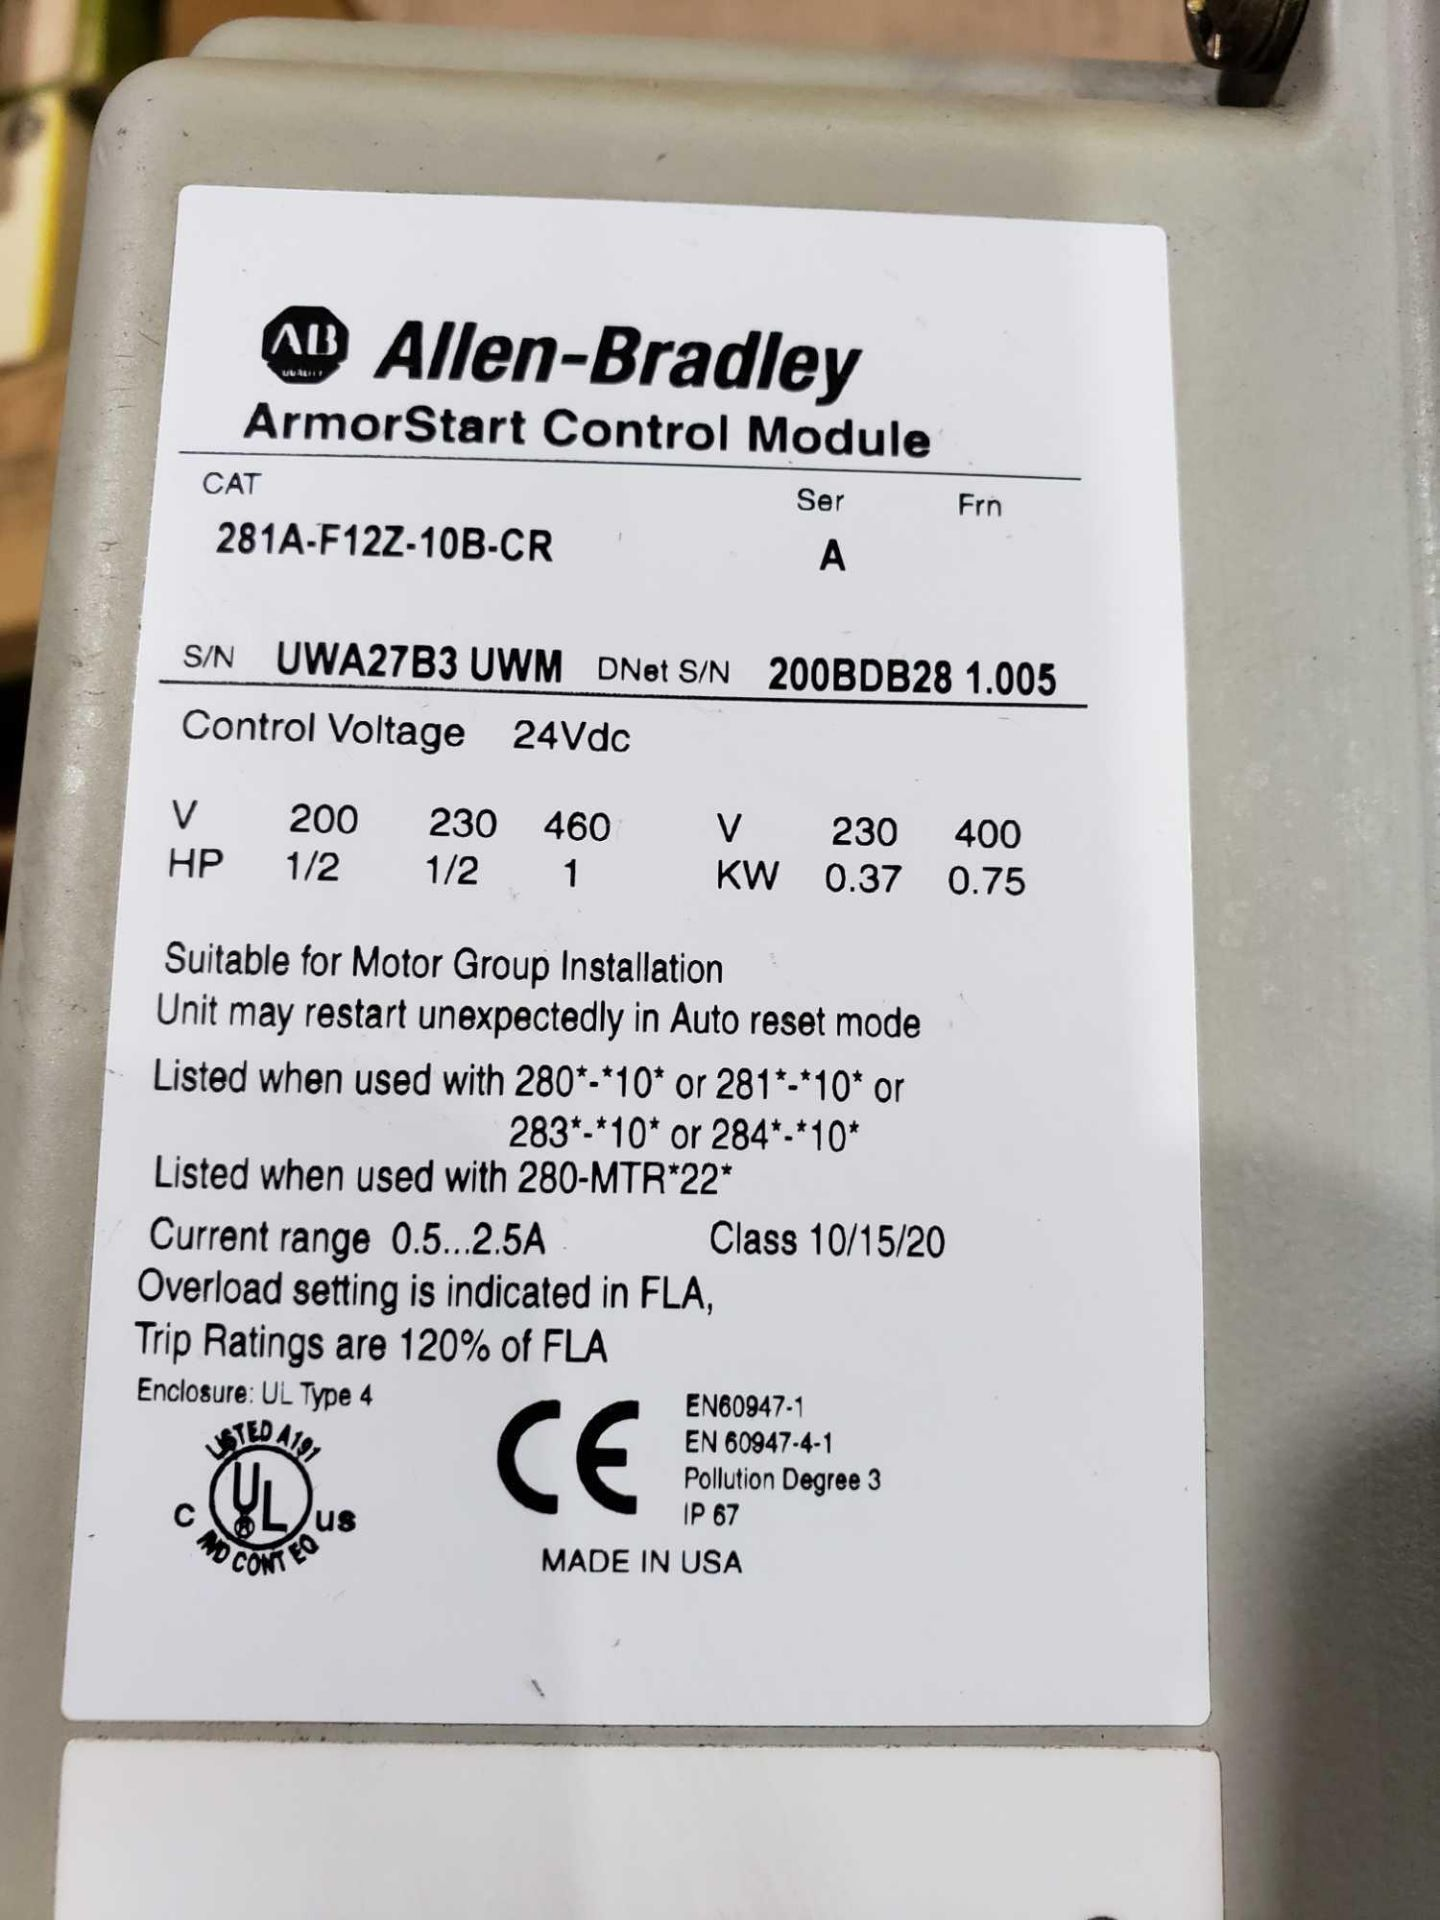 Lot 9 - Allen Bradley Armorstart Catalog 281A-F12Z-10A-CR with base Catalog 281A-F12Z-10B-CR.